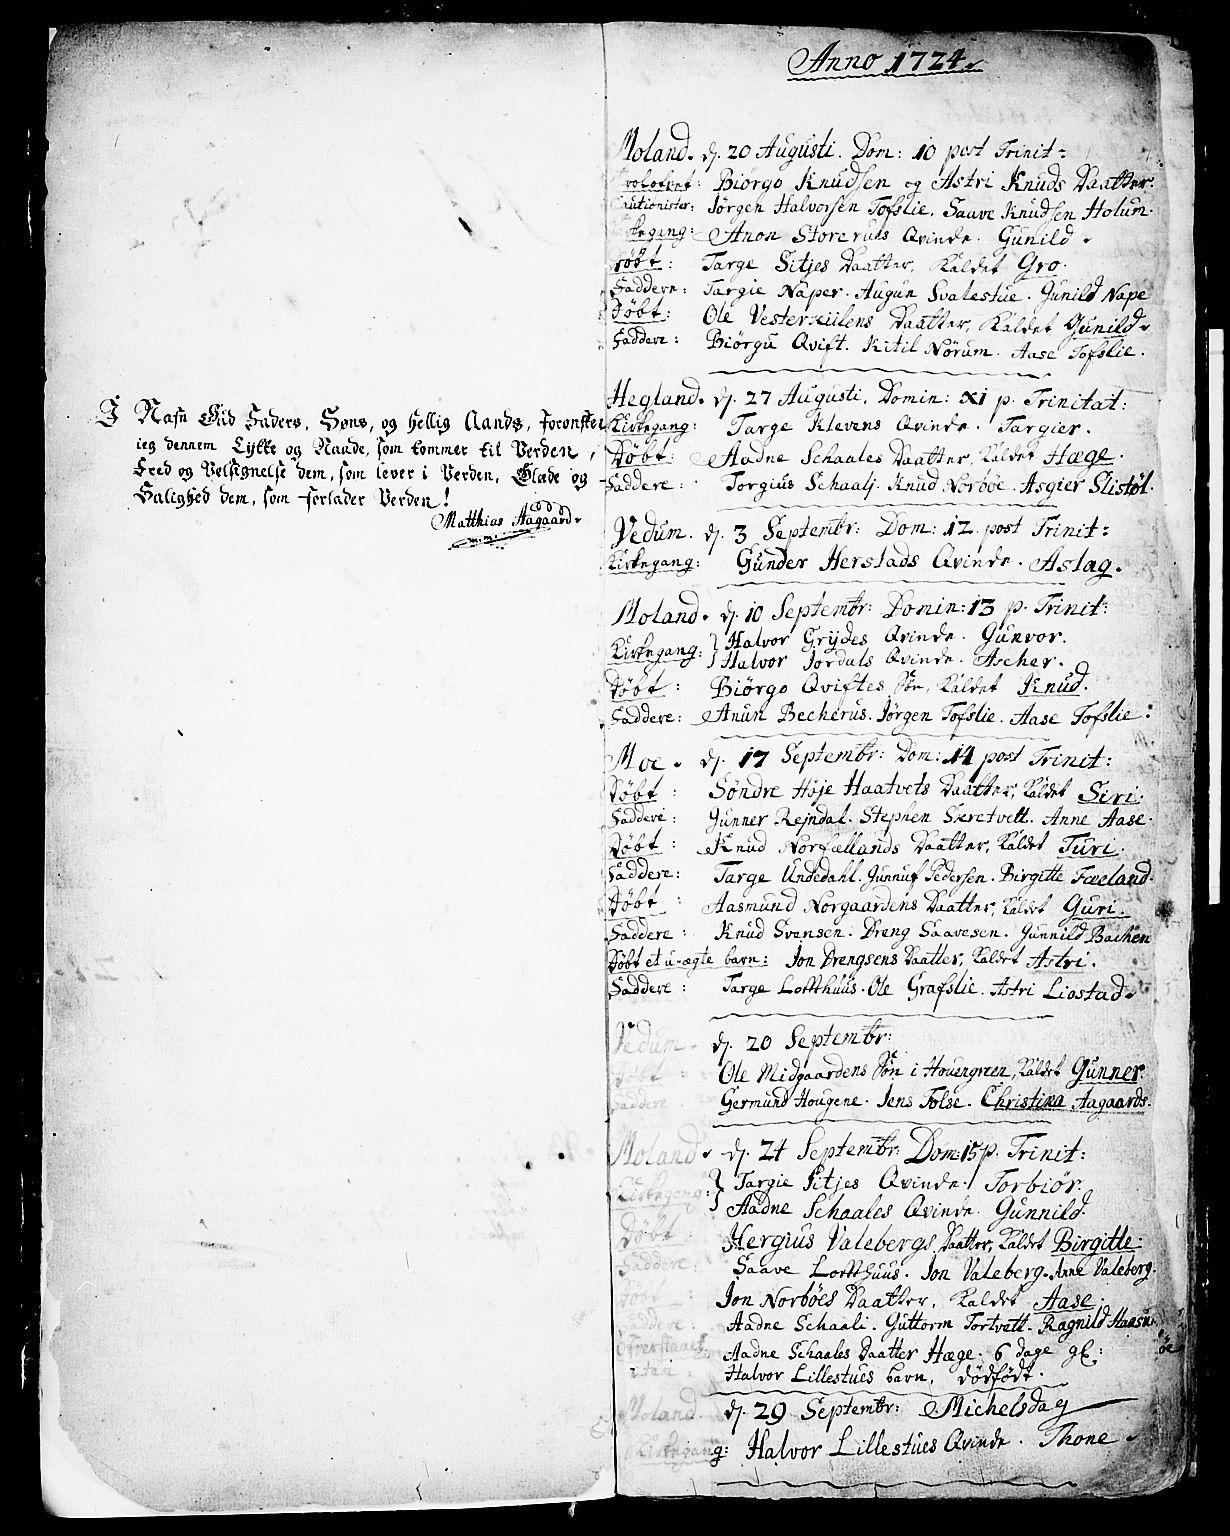 SAKO, Fyresdal kirkebøker, F/Fa/L0001: Parish register (official) no. I 1, 1724-1748, p. 2